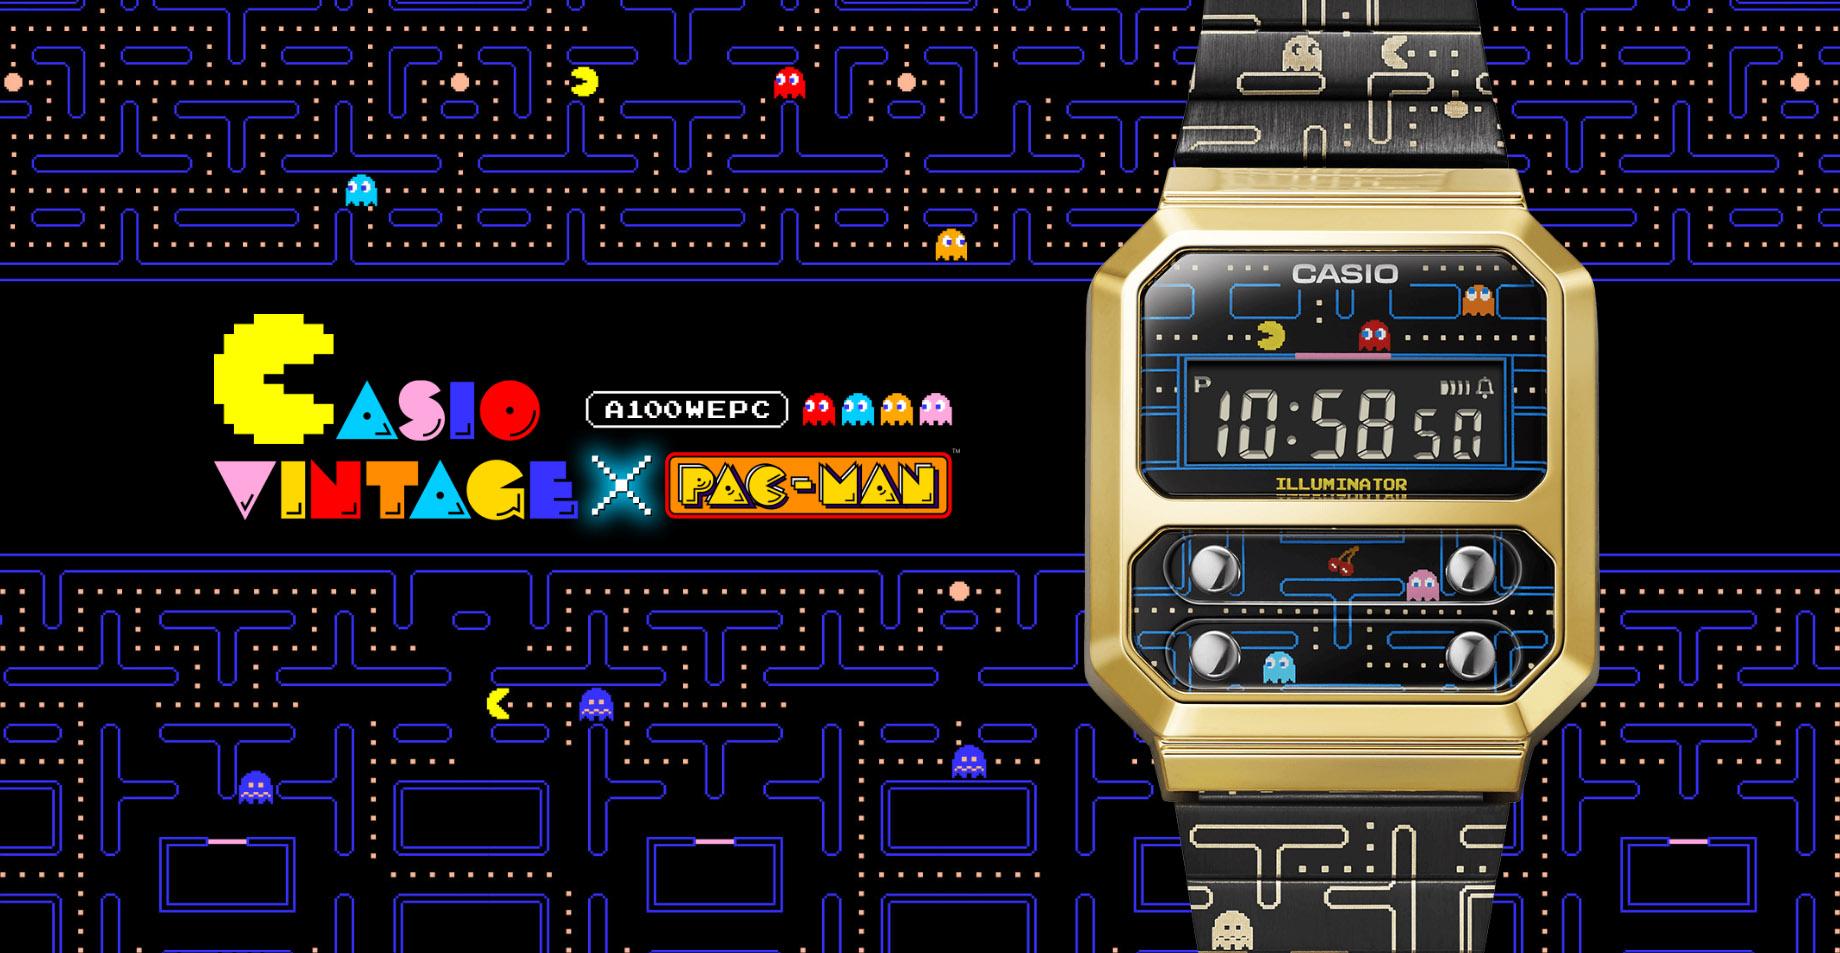 Casio unveils the Pac-Man edition A100 digital watch